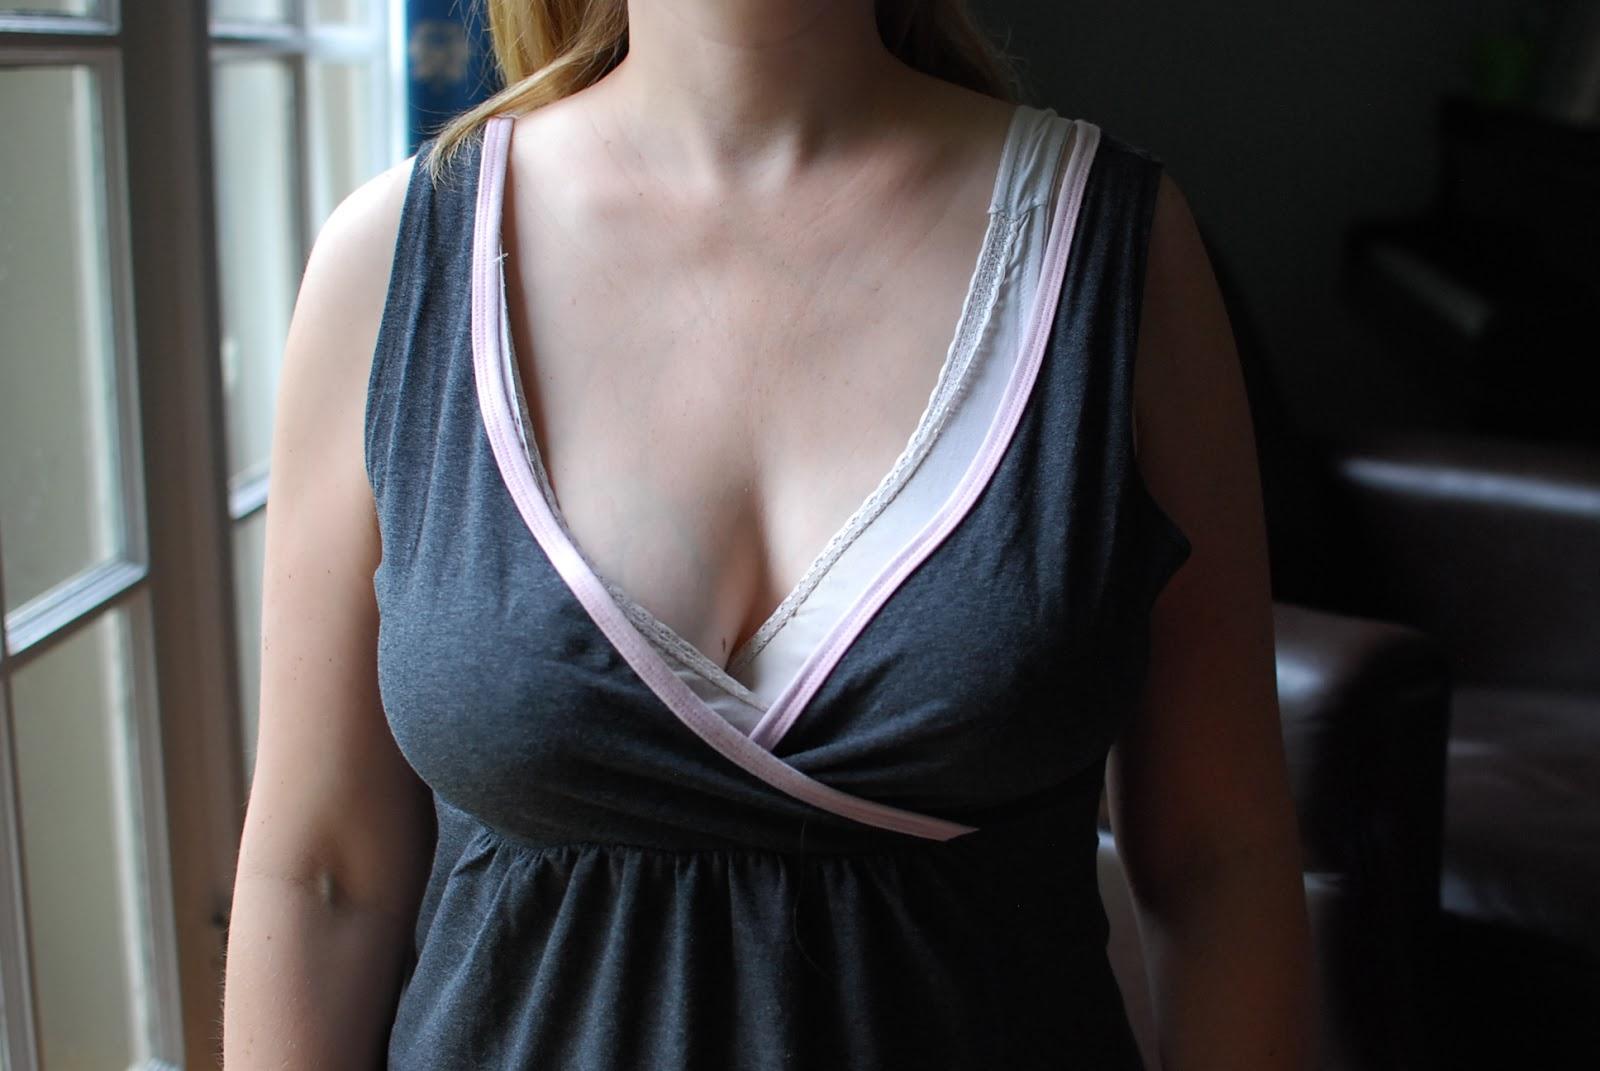 High porn girls online